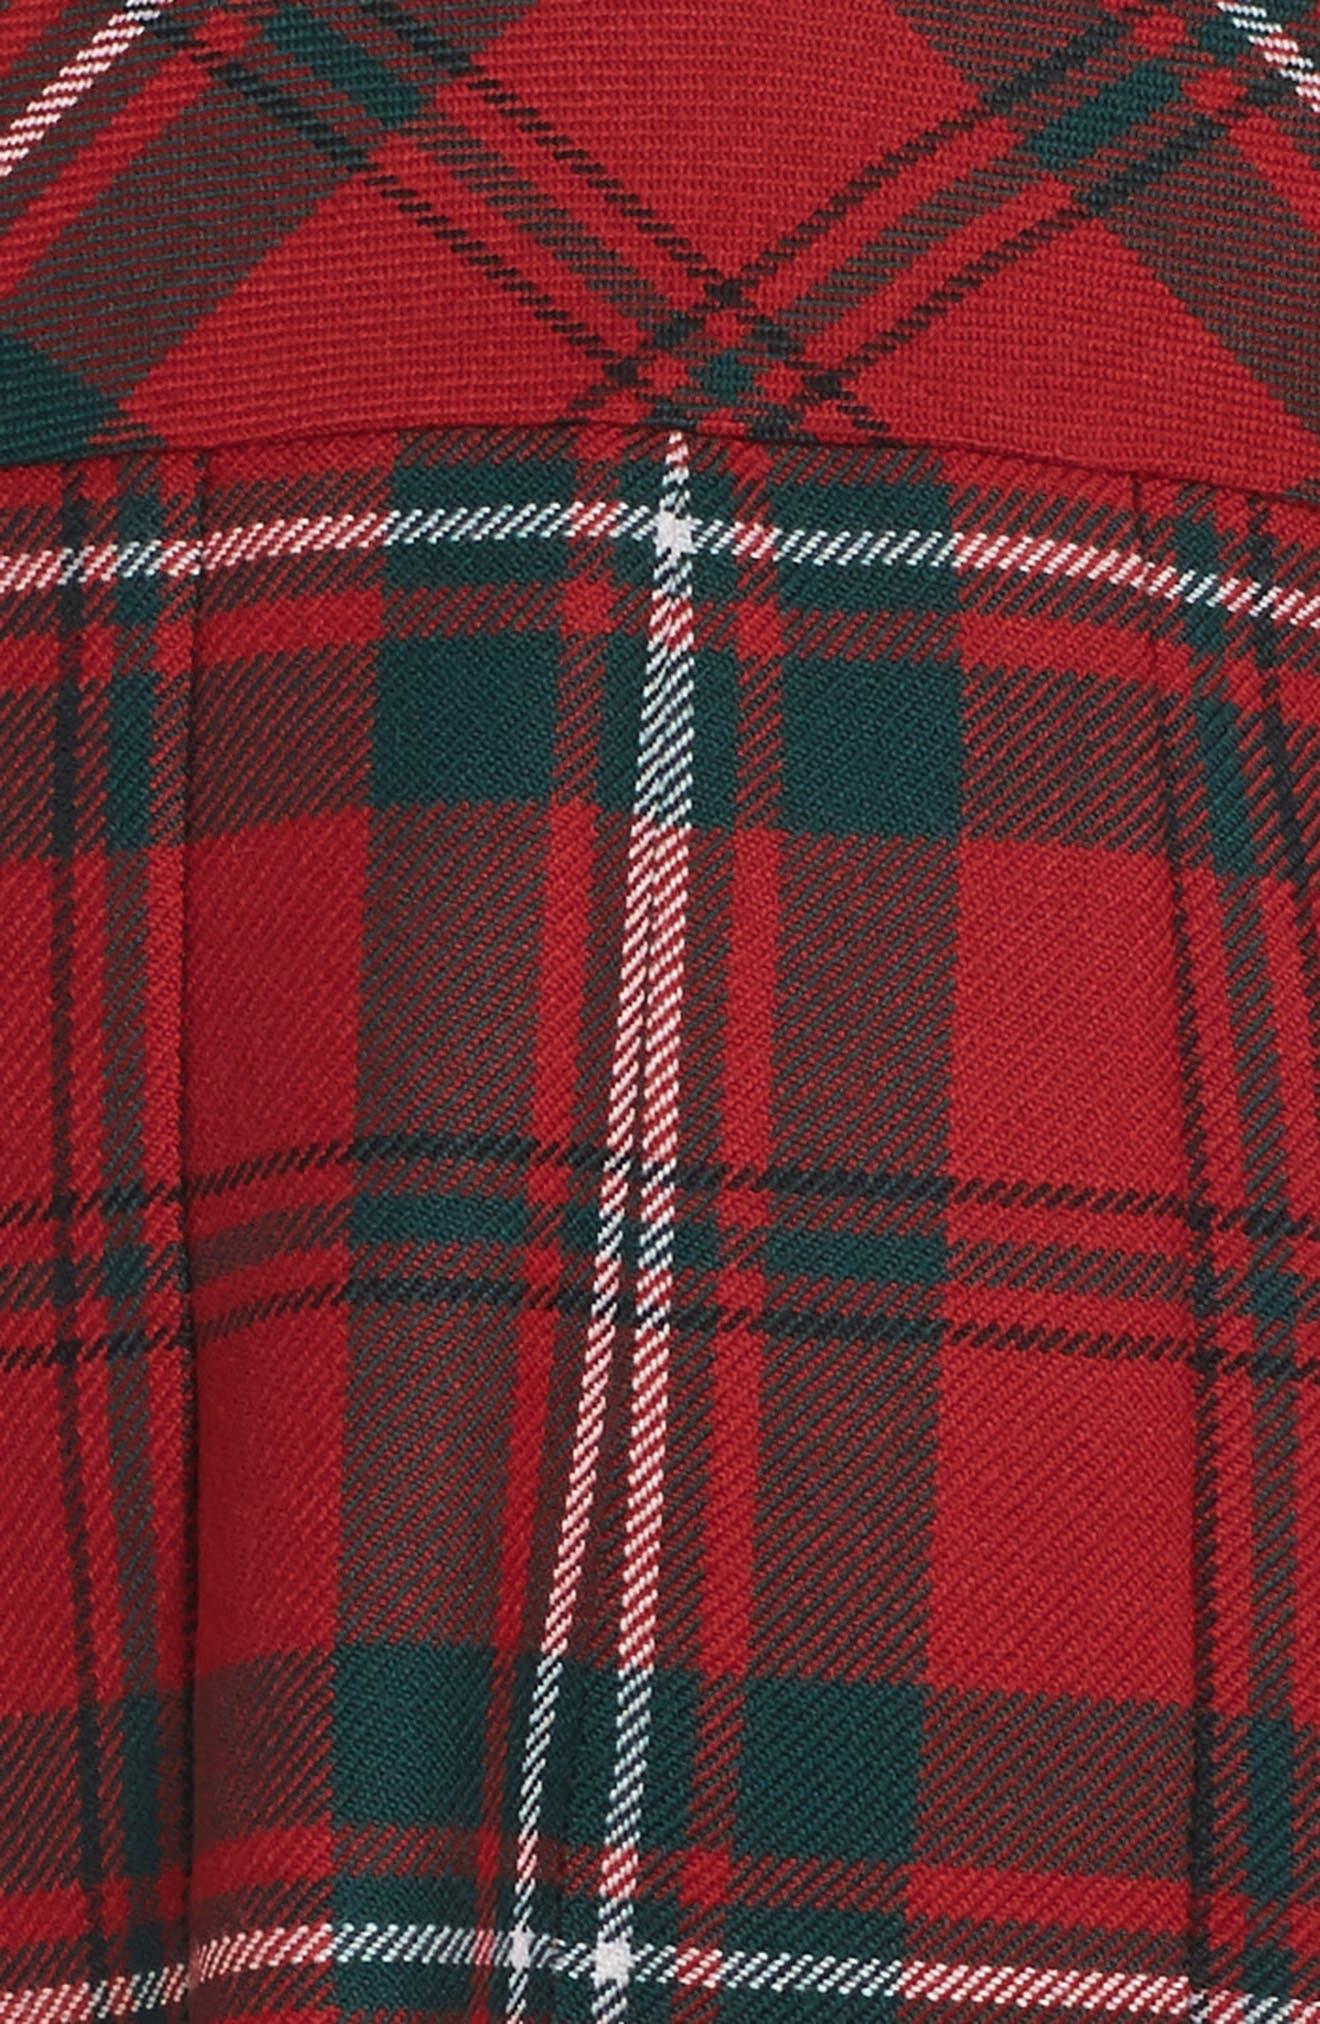 Plaid Wool Dress,                             Alternate thumbnail 3, color,                             641